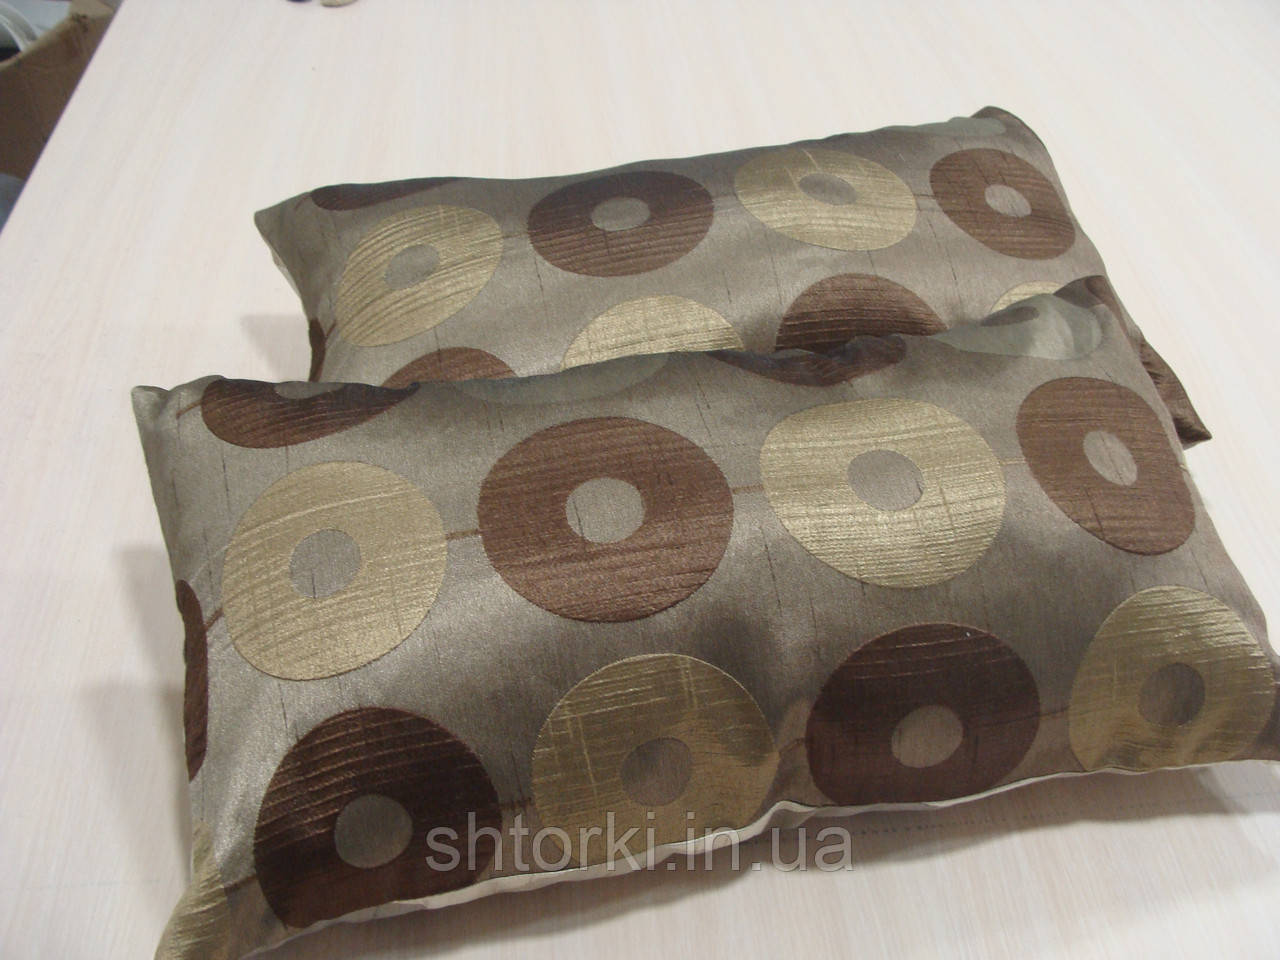 Комплект подушек  2шт коричневые Диско 55х30см